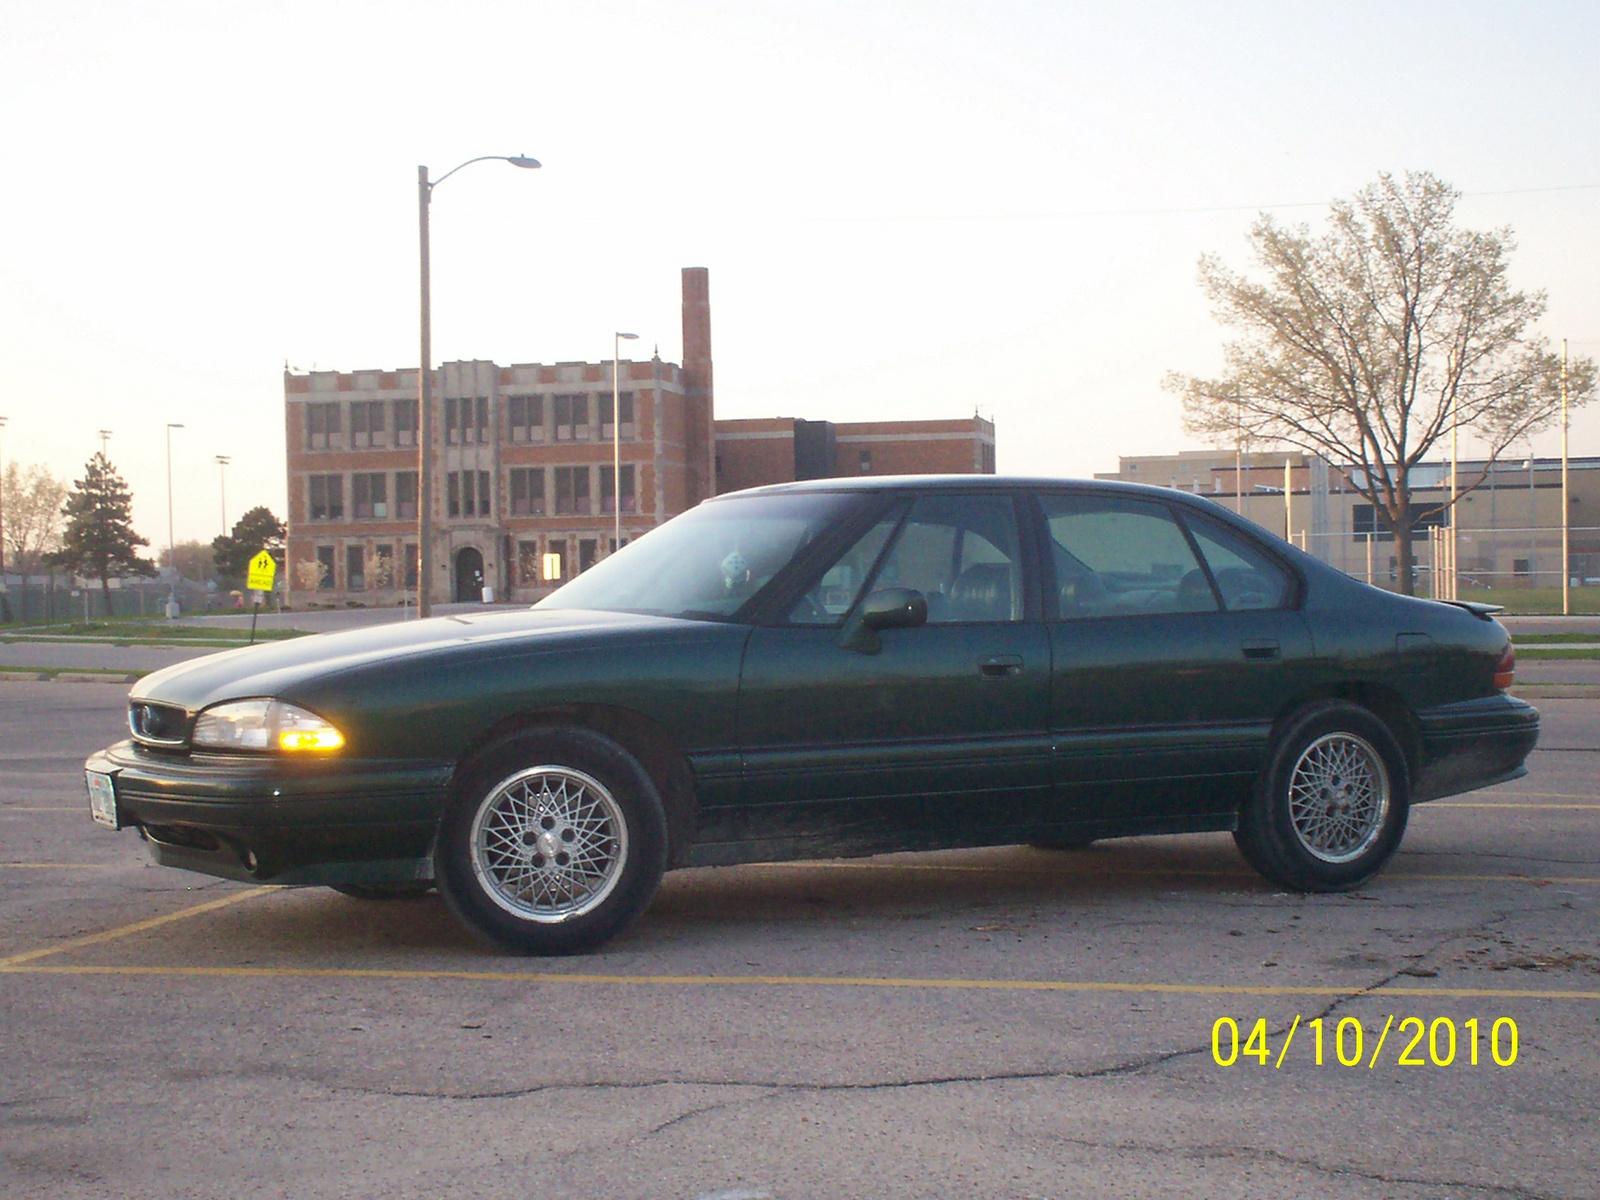 2001 pontiac bonneville se with 1994 Pontiac Bonneville Overview C3345 on Chevy Express Van Light Wiring Diagram additionally 7n1cz Pontiac Grand Se Oil Sending Unit Located besides 1999 Pontiac Bonneville Pictures C3315 pi36381810 moreover 2001 Pontiac Grand Prix Pictures C3306 pi36735555 as well Exterior.